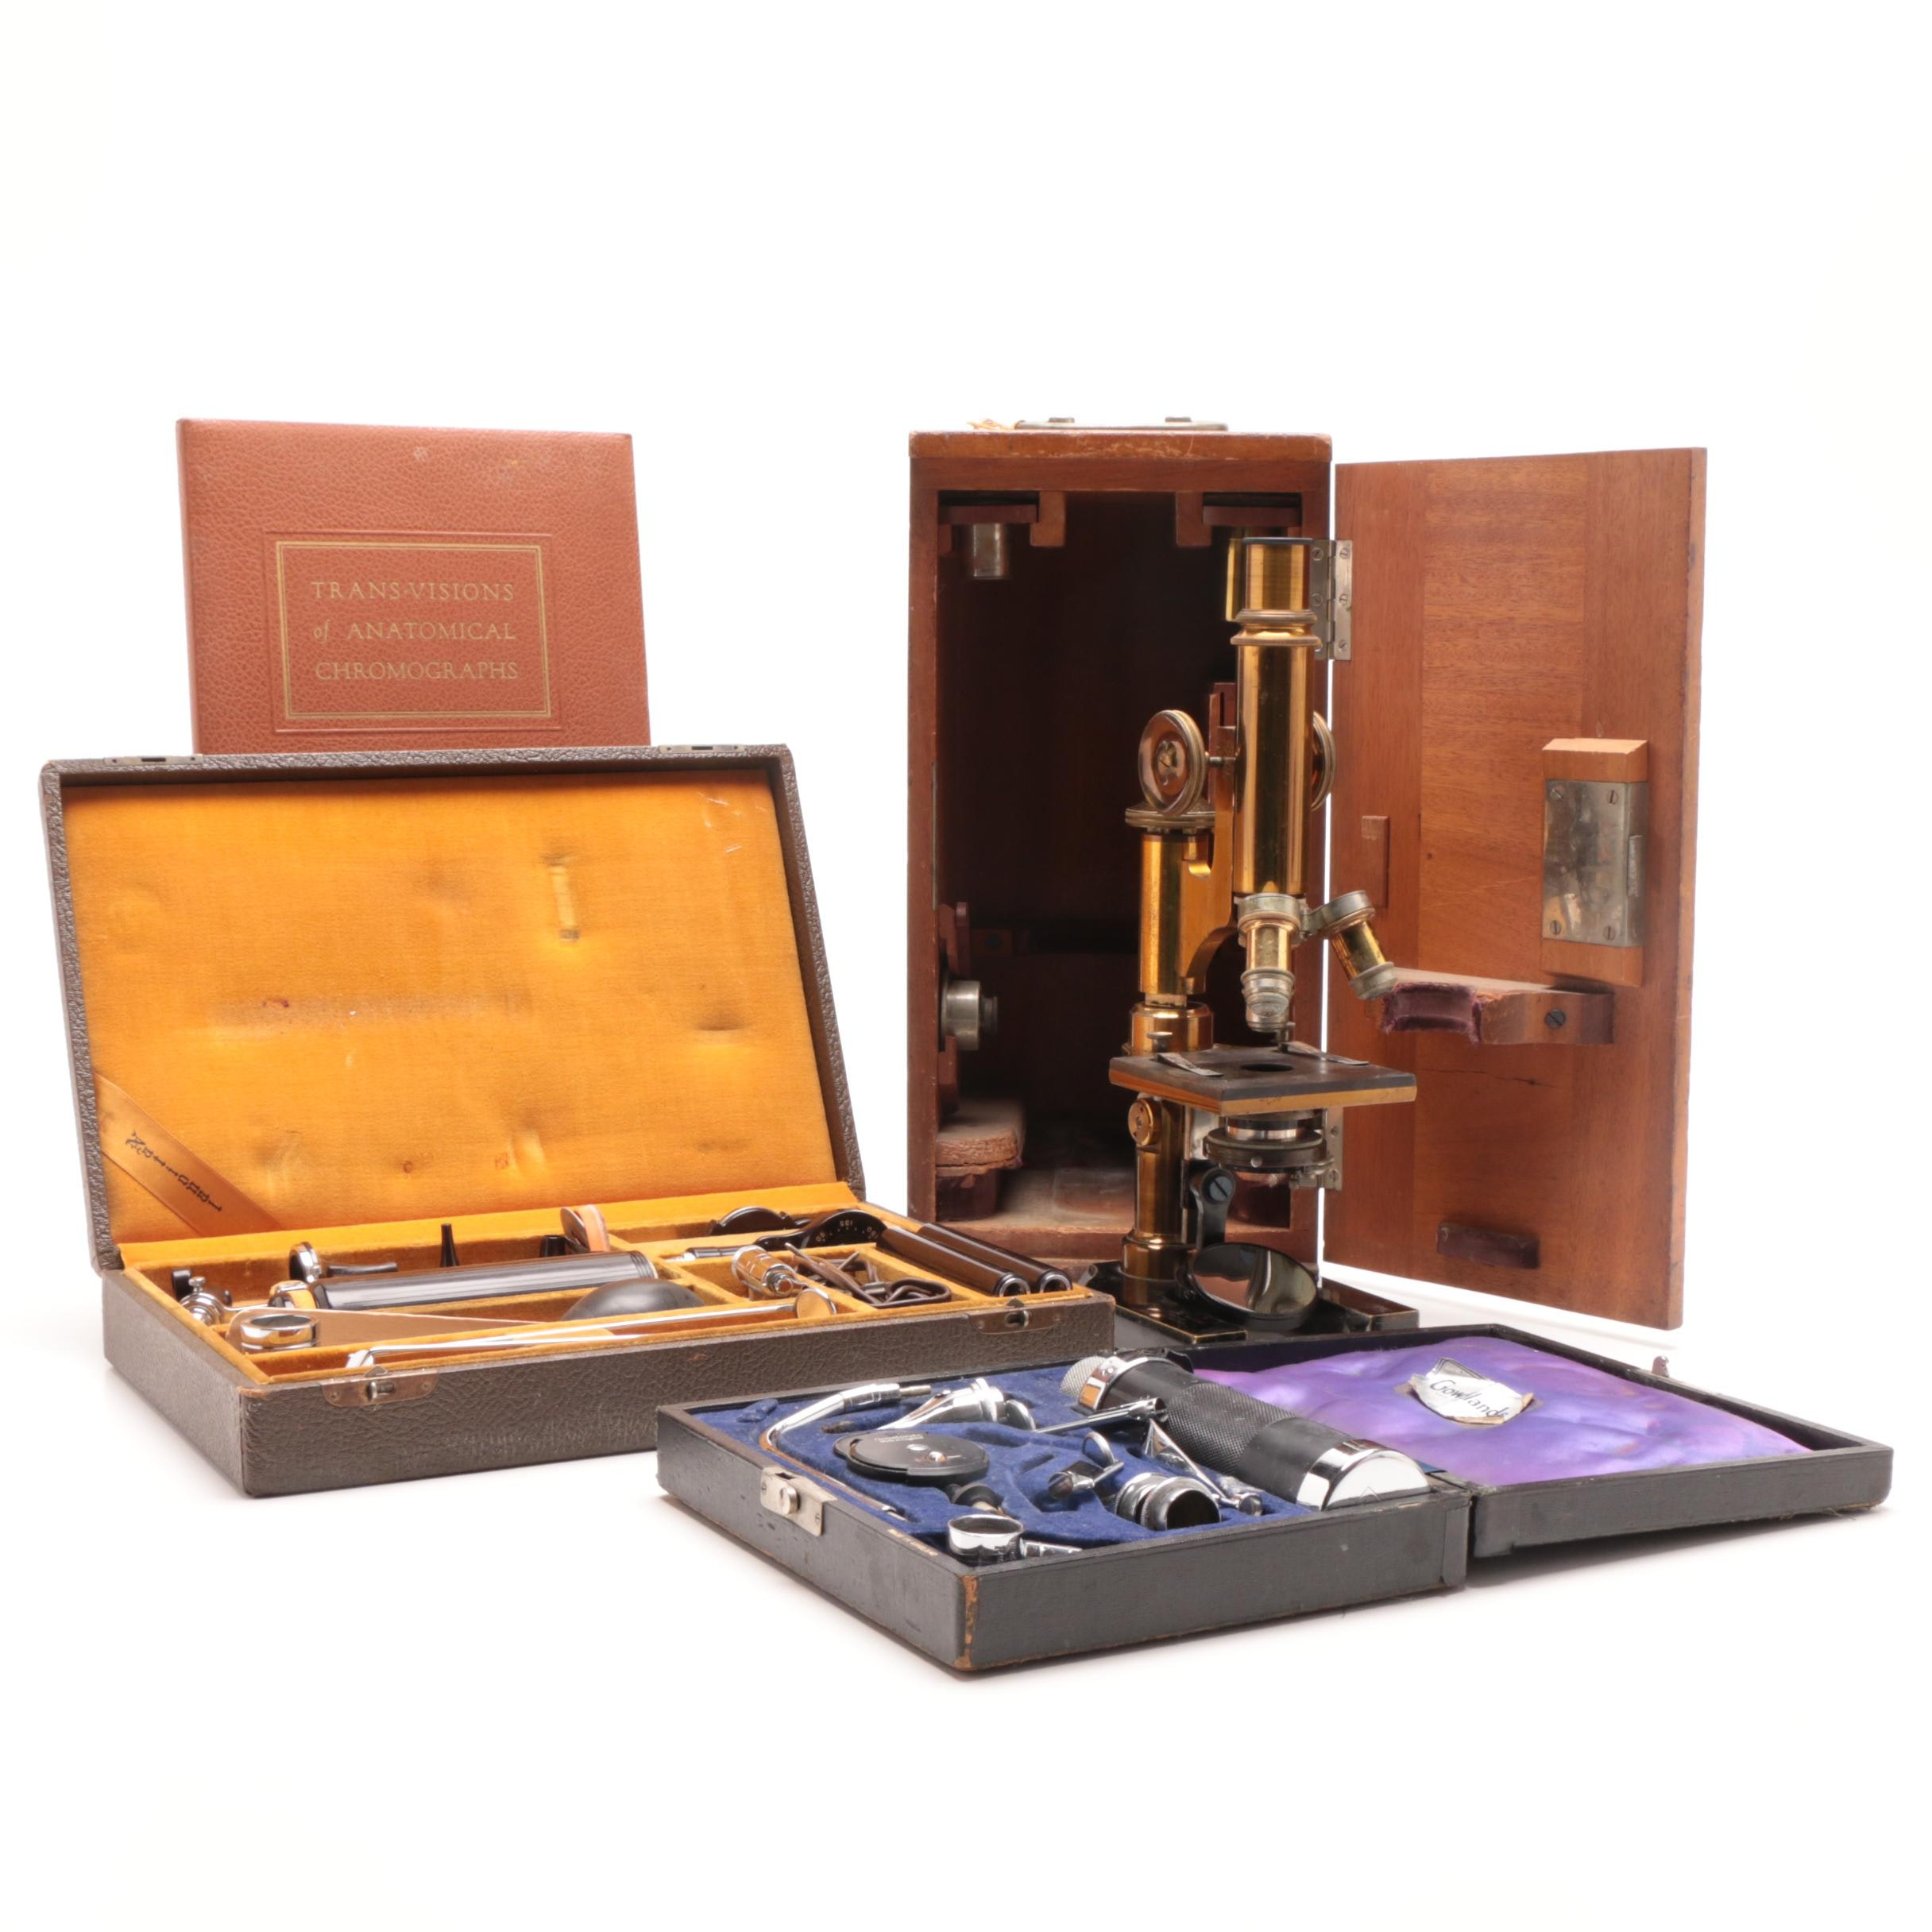 Antique E. Leitz Wetzlar Microscope and Vintage Medical Devices